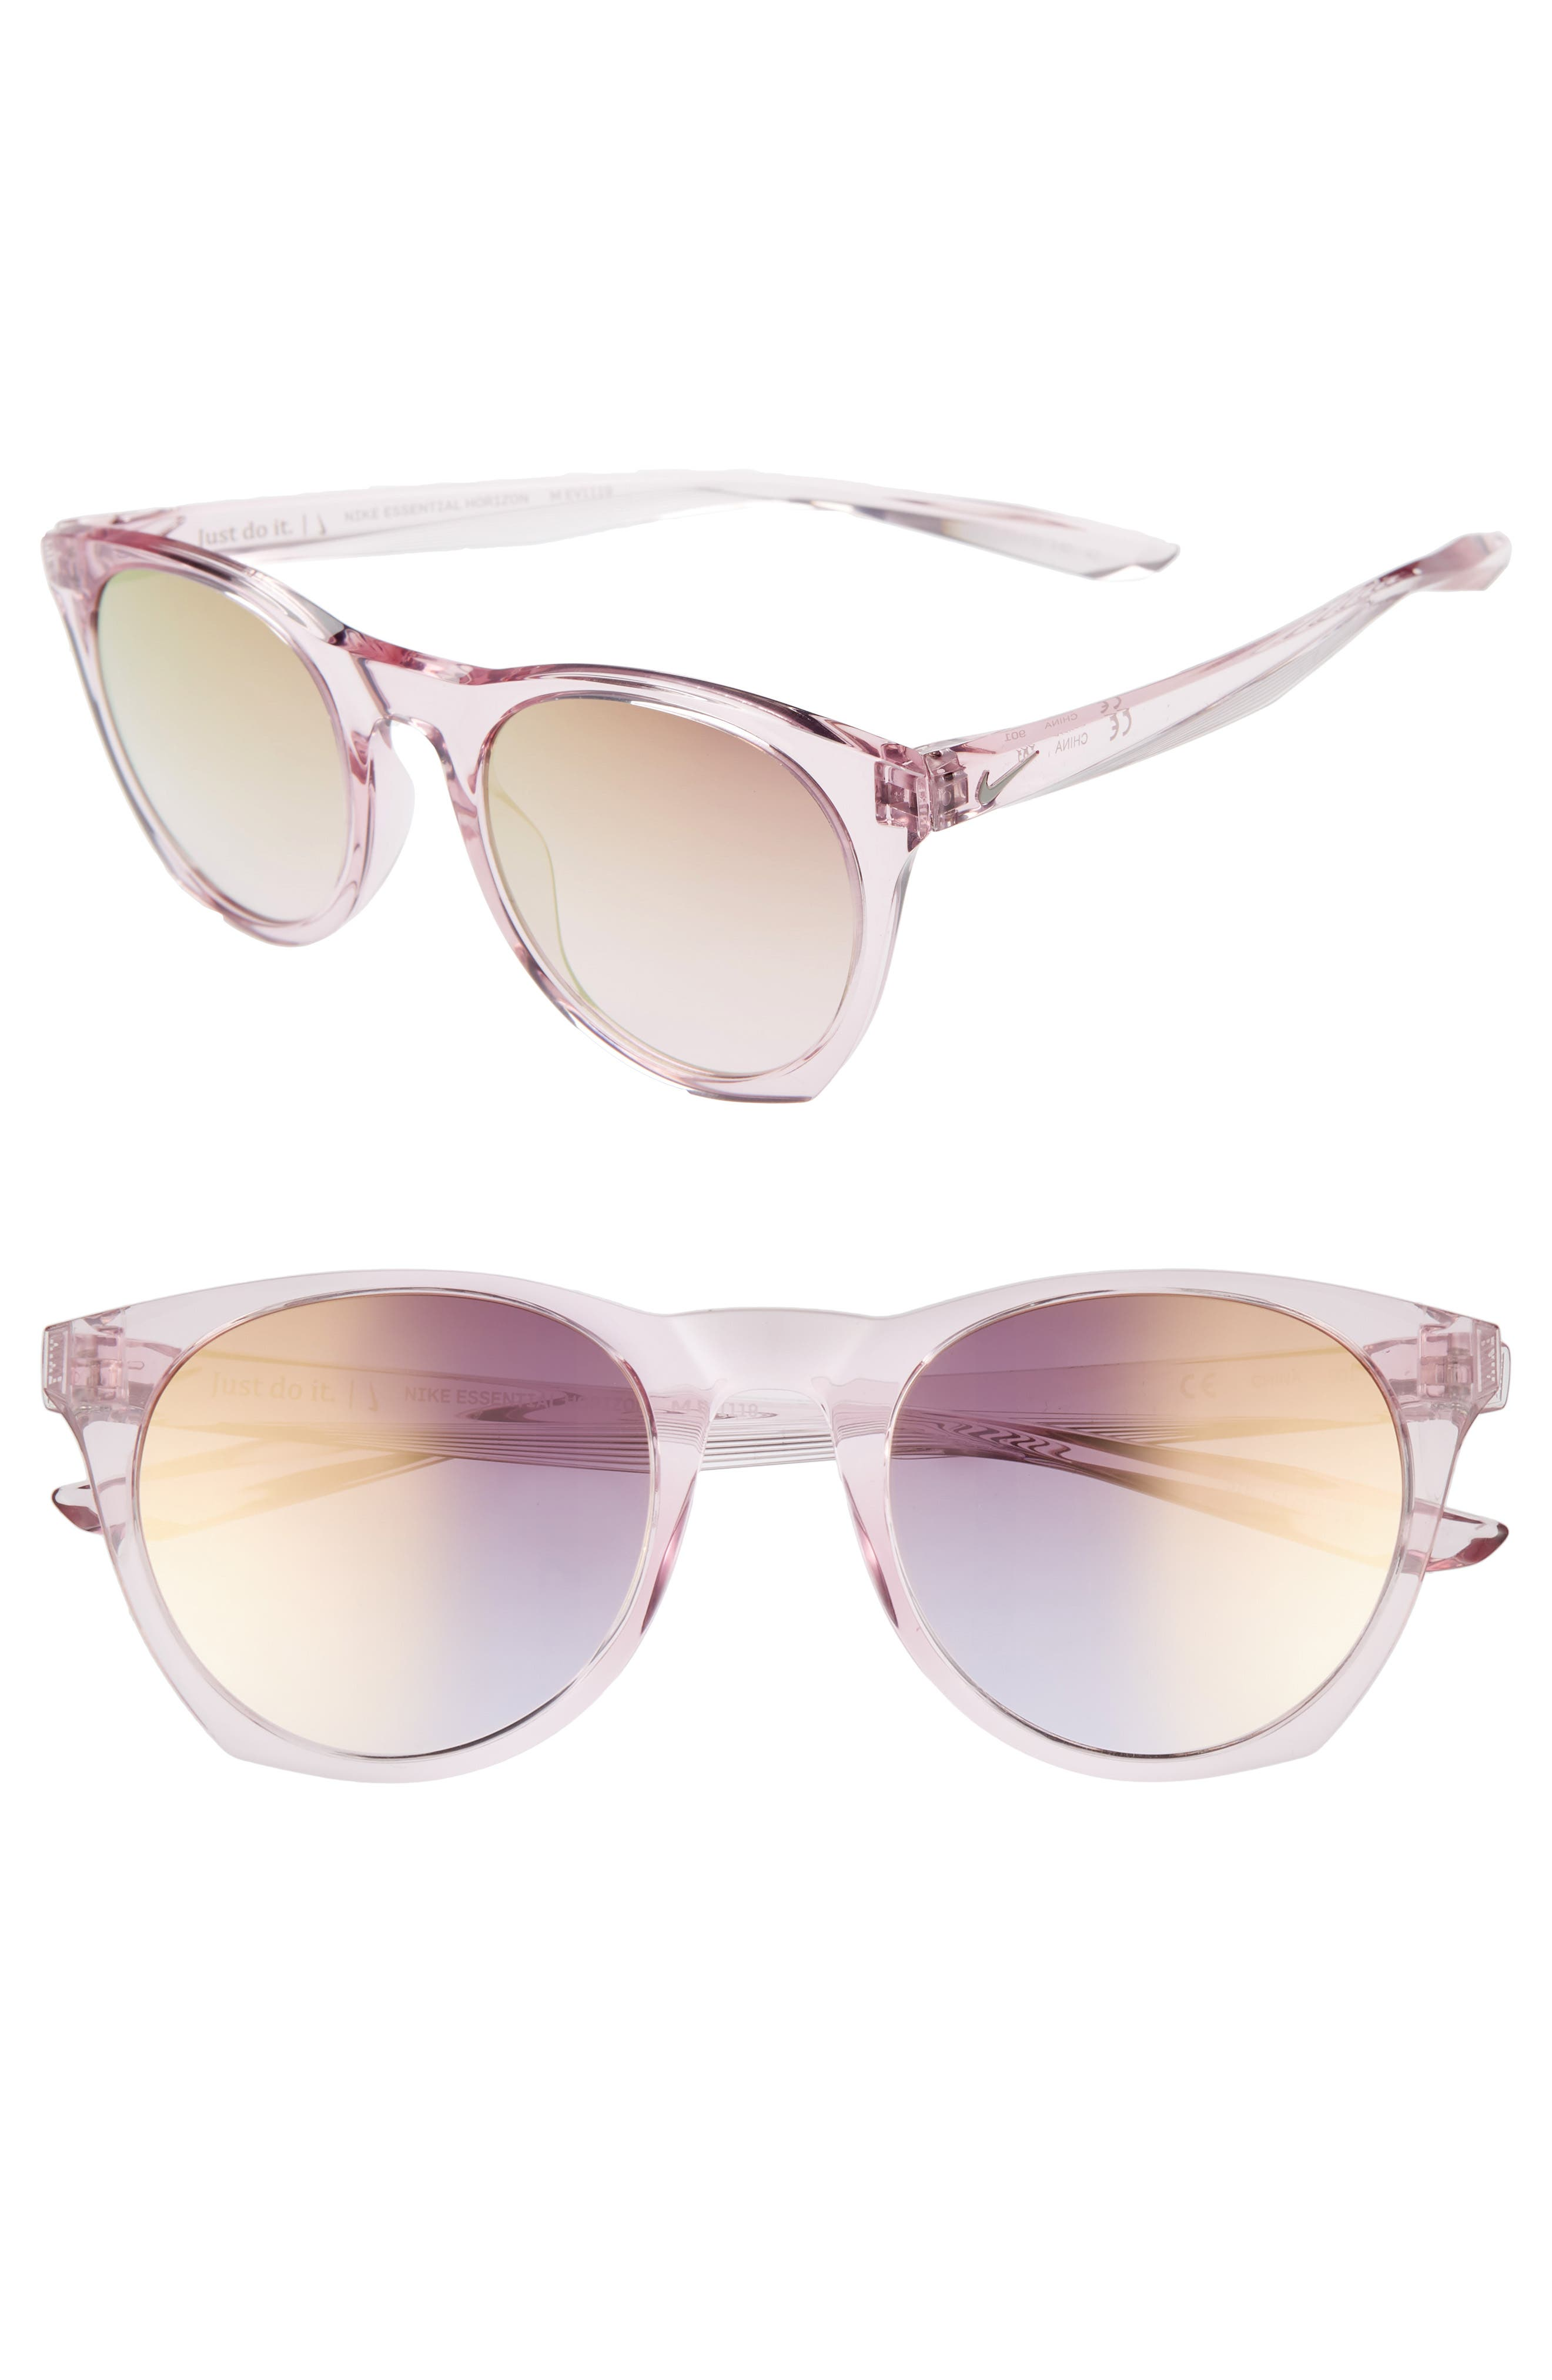 Nike Essential Horizon 51Mm Mirror Sunglasses - Plum Chalk/ Pink